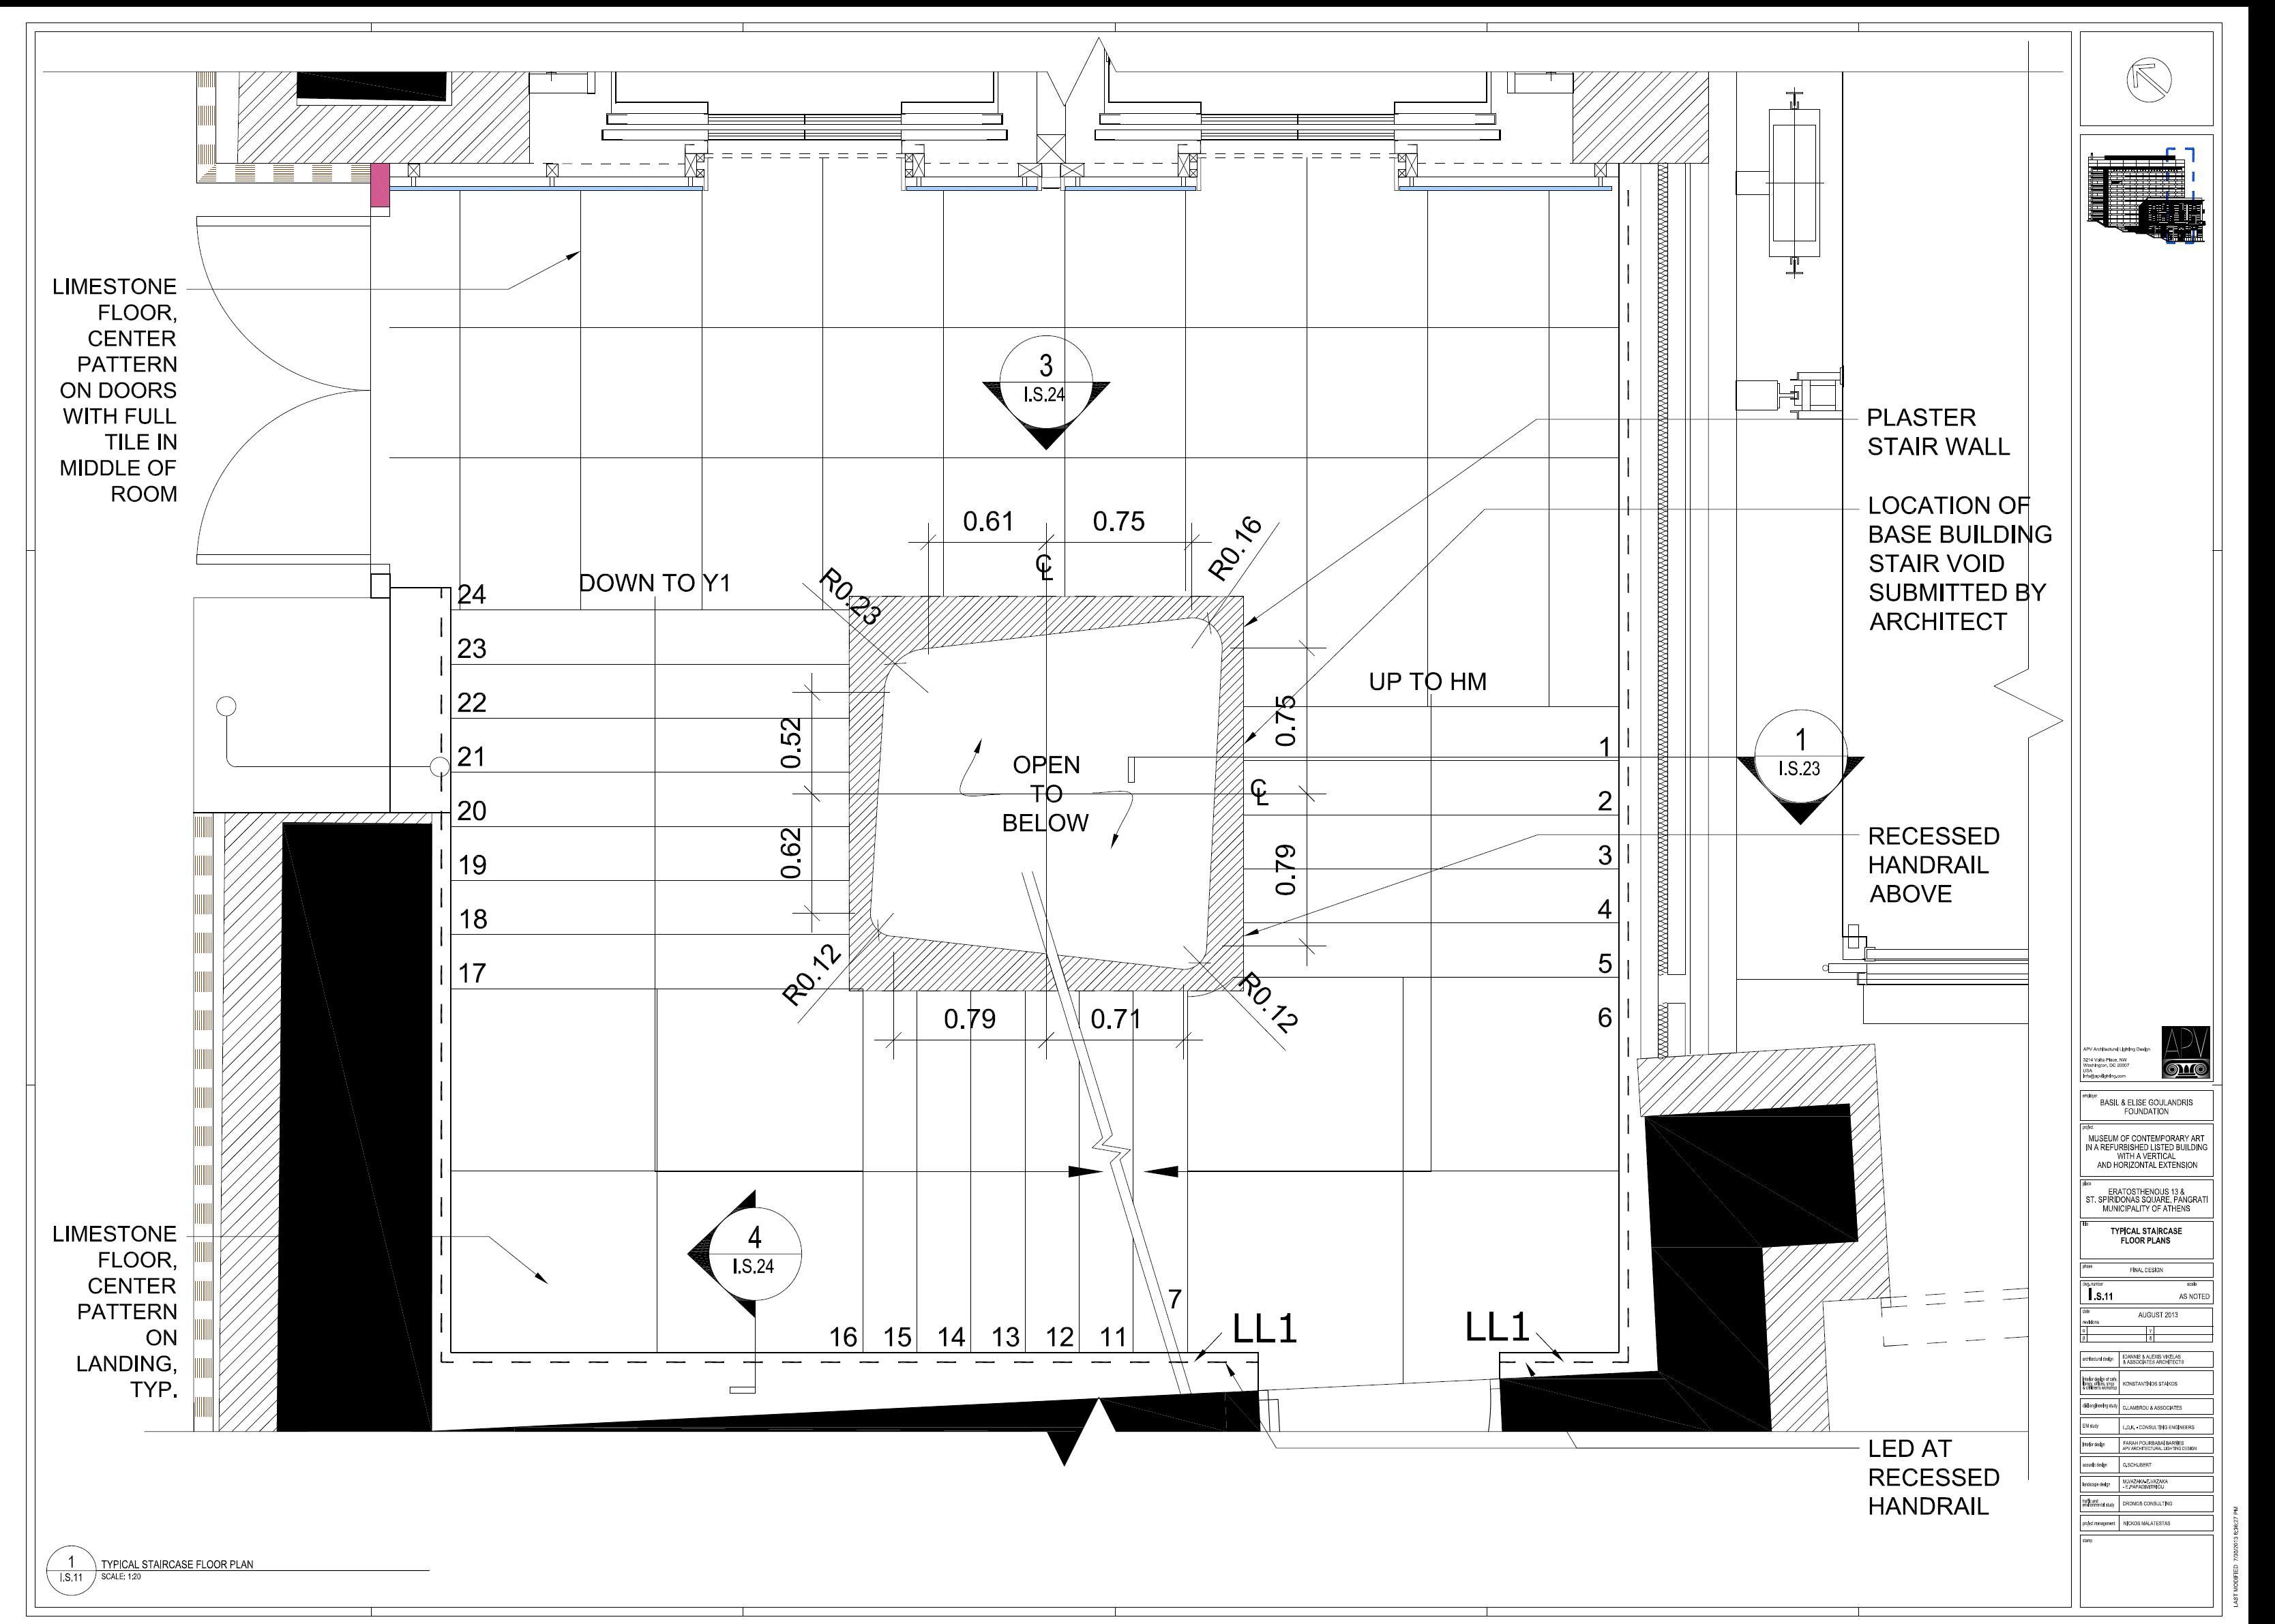 Plan View Stairs- APV- Farah Barnes crea